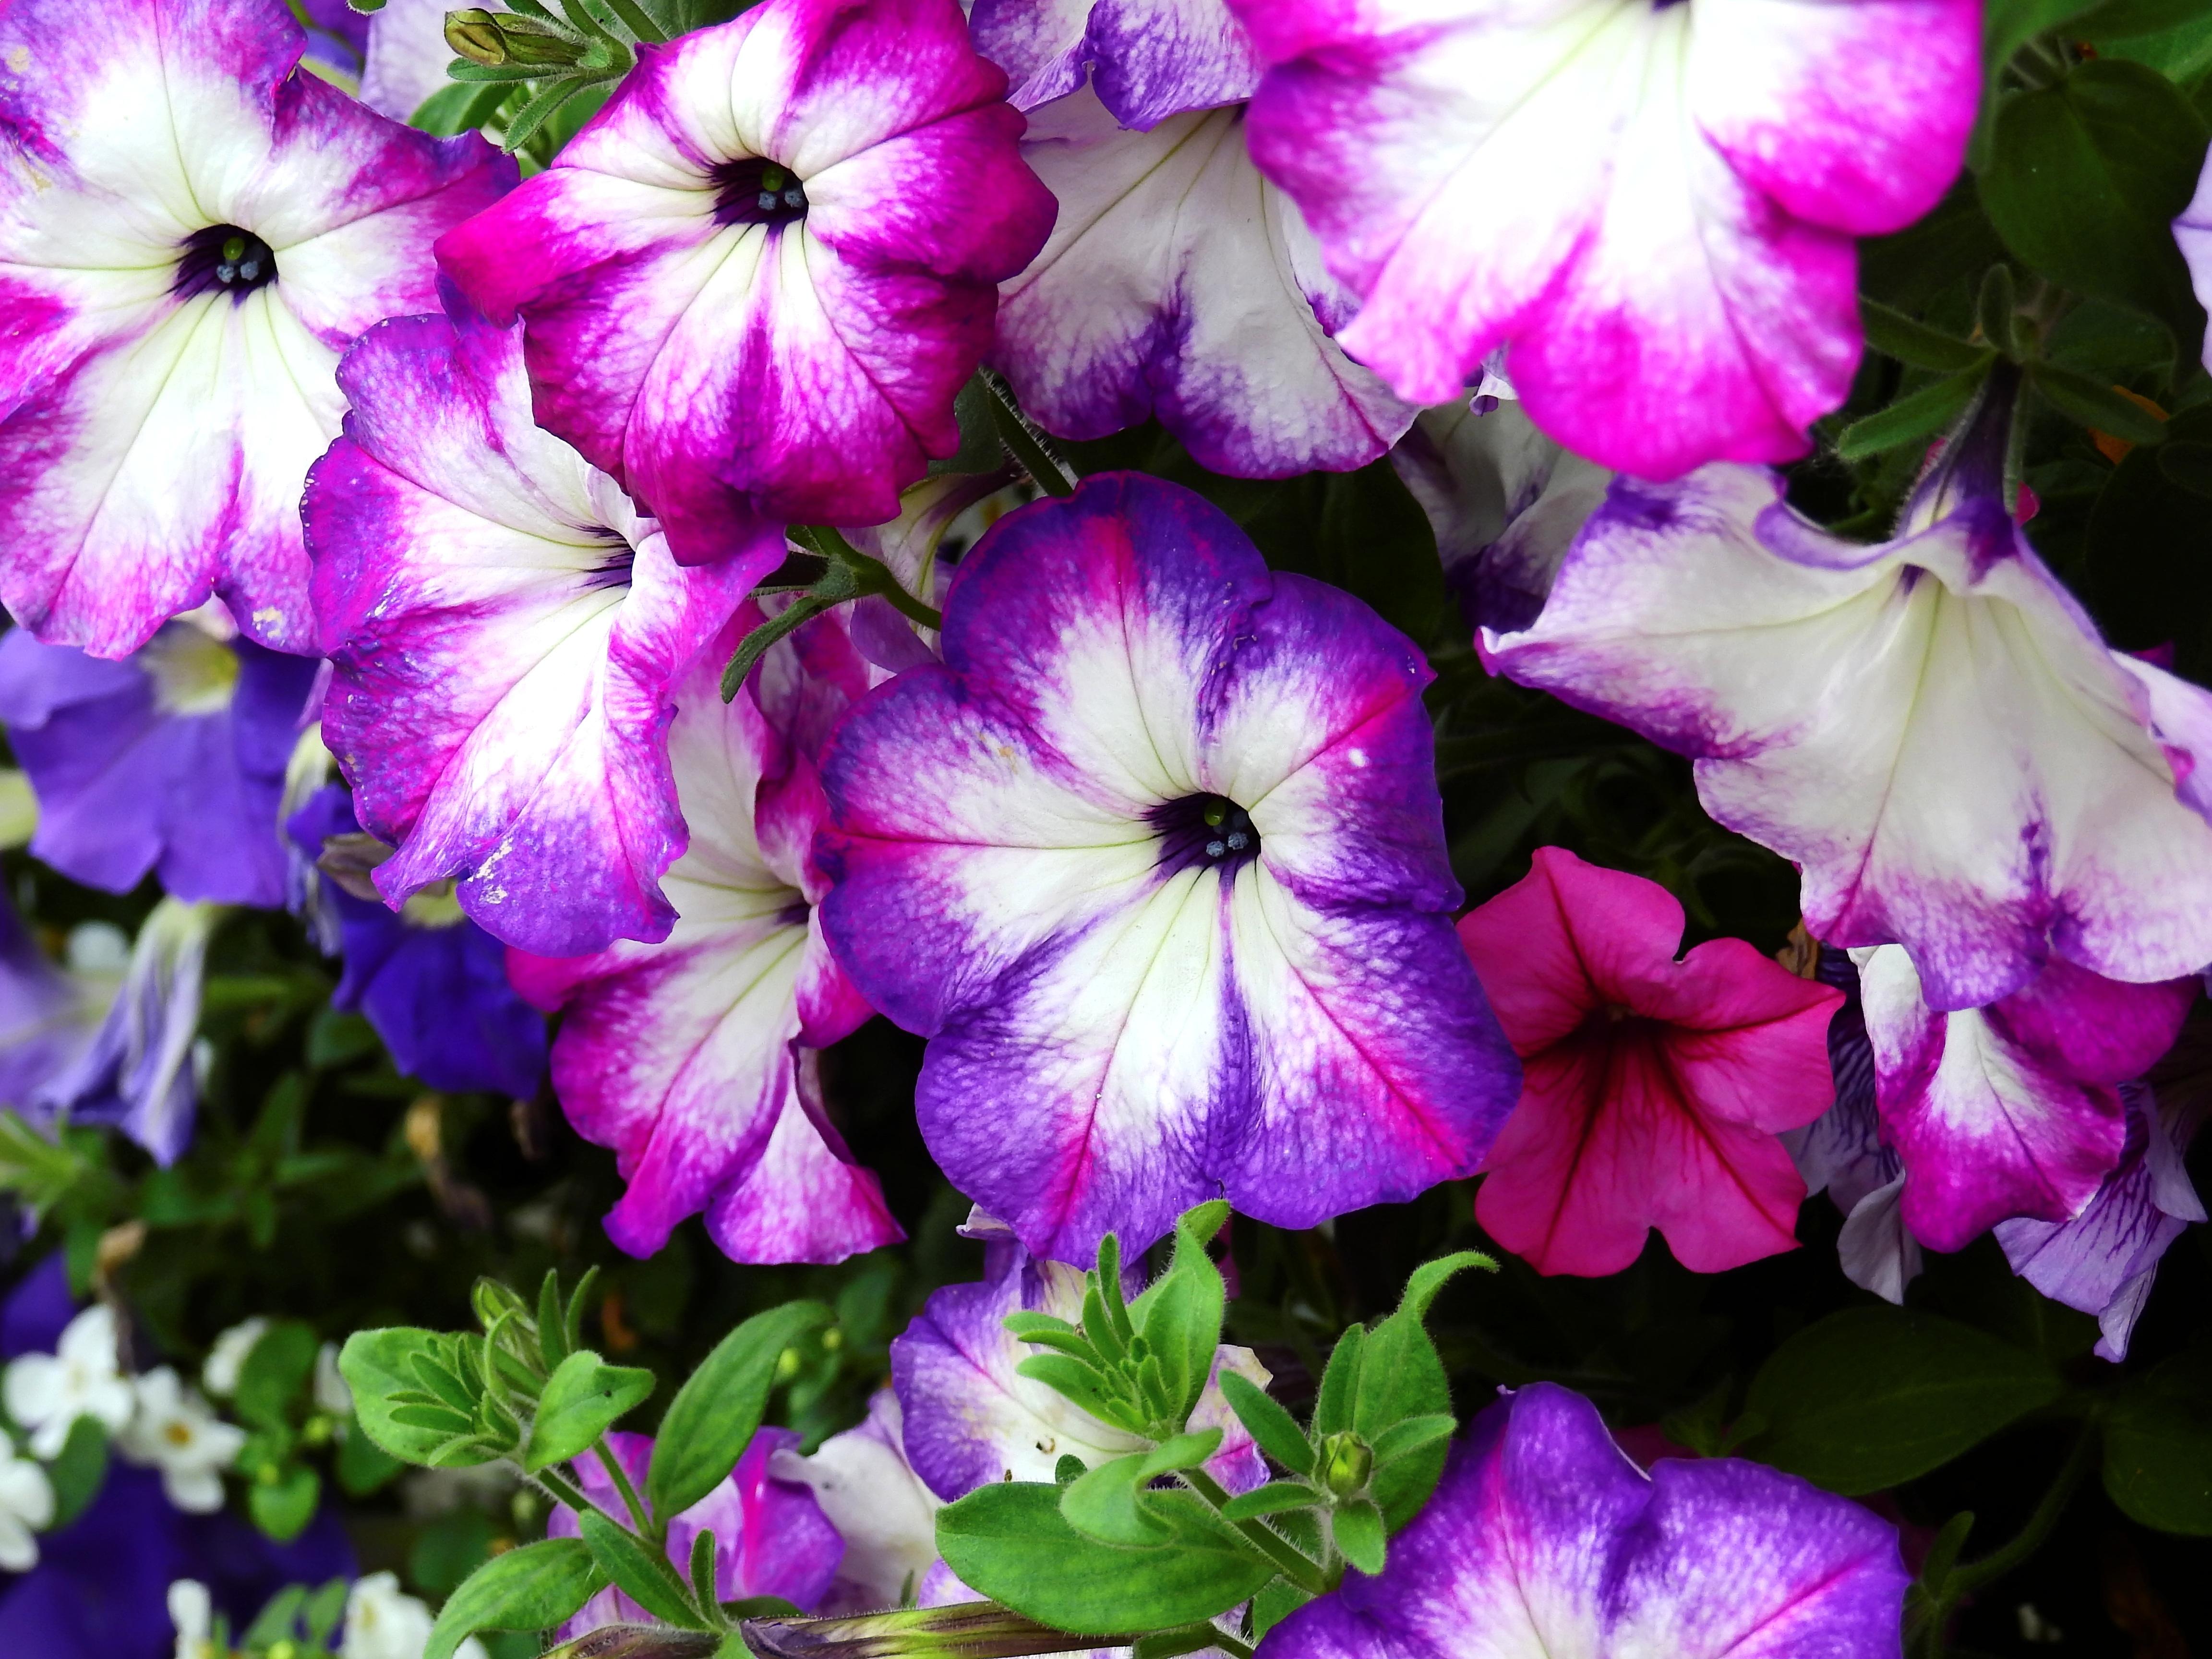 kostenlose foto natur bl hen lila bl tenblatt botanik rosa flora blumen hintergrund. Black Bedroom Furniture Sets. Home Design Ideas